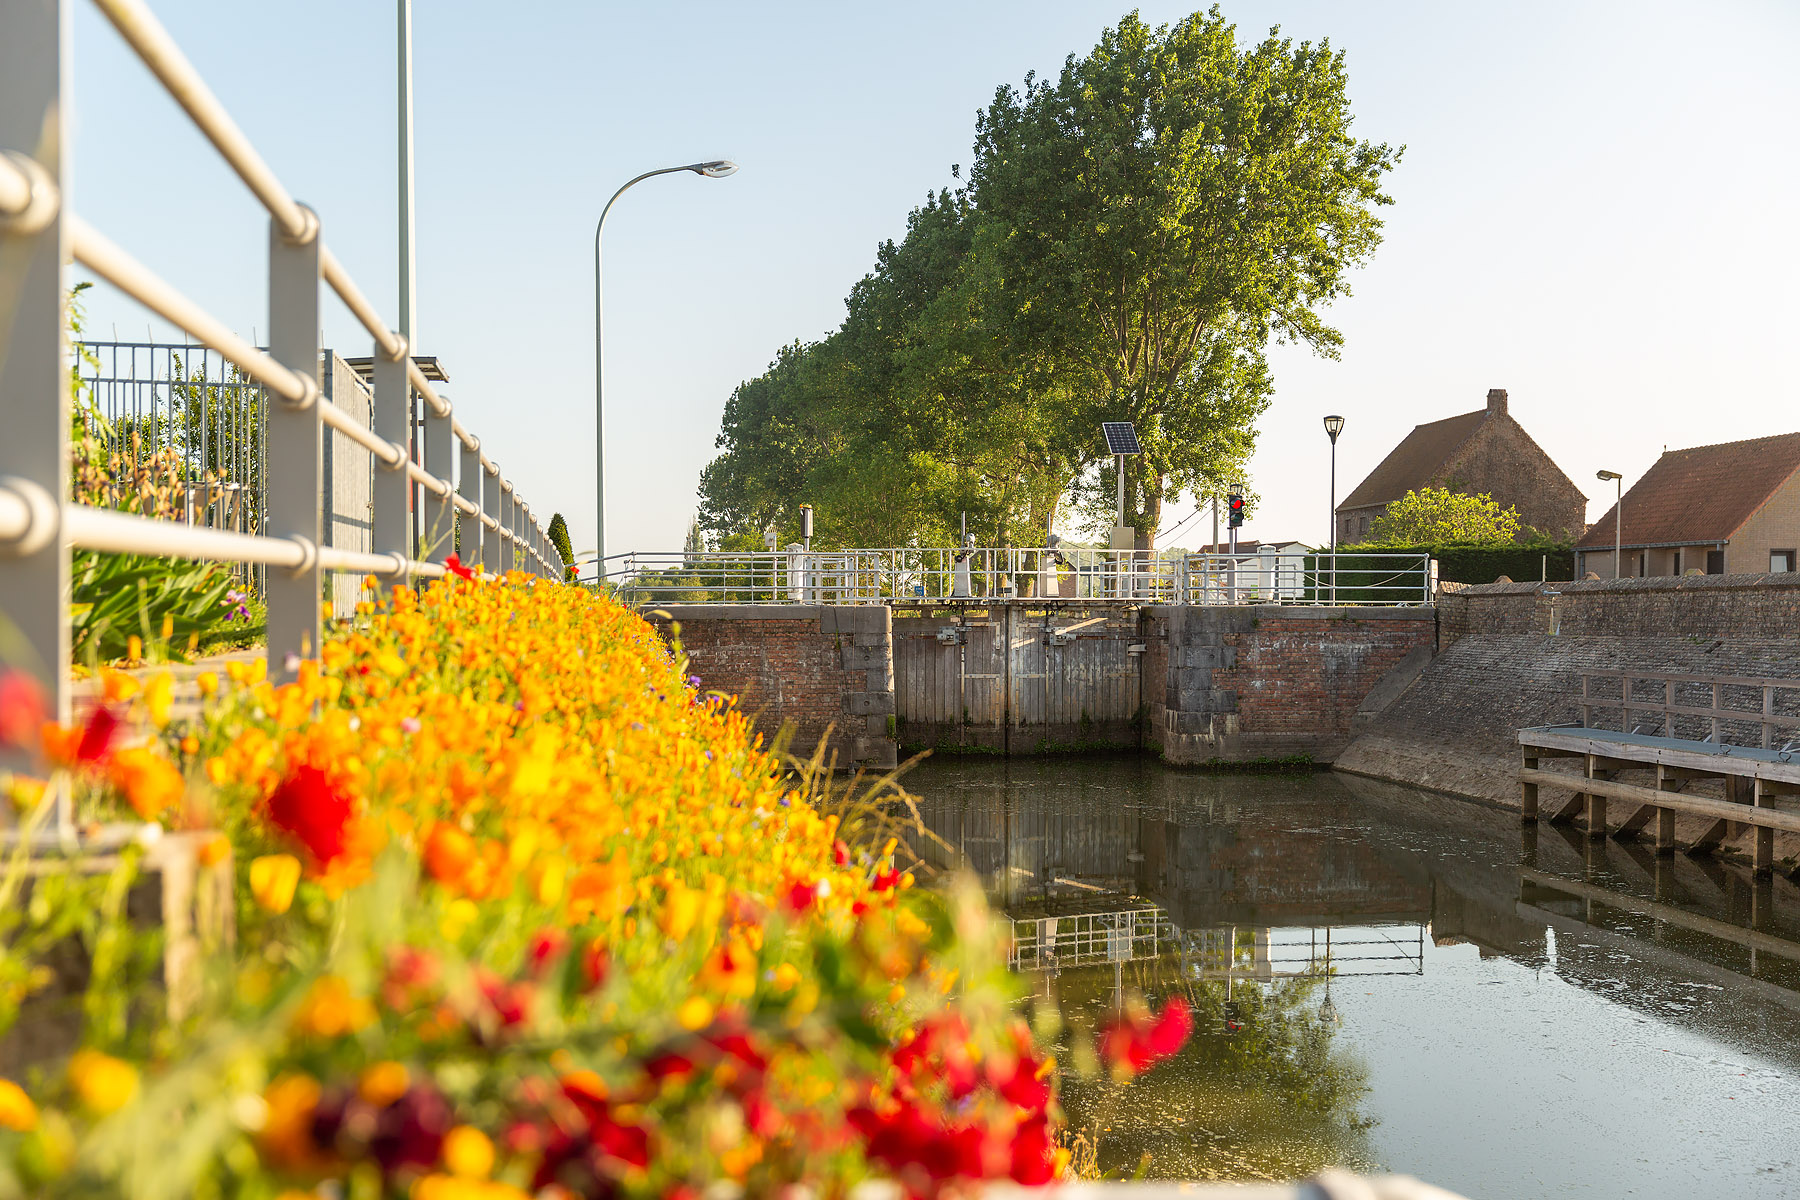 Het prachtige landschap rondom Fintele, Landschapsfotografie in Fintele, Fintele, De Fintelesluis in Fintele, België, Glenn Vanderbeke